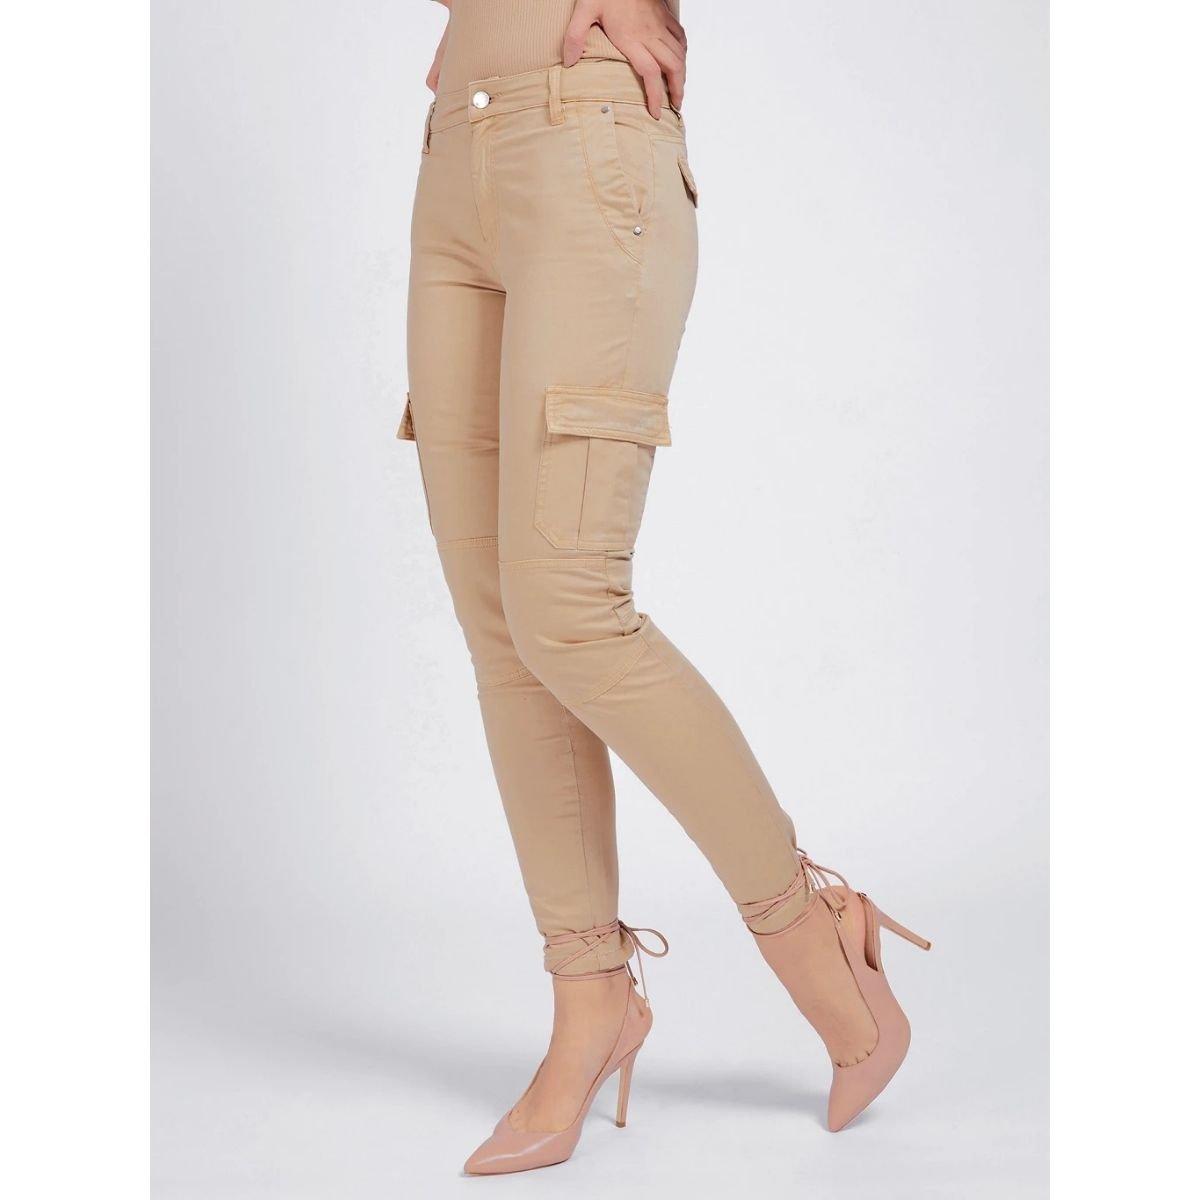 Pantalone Guess In Cotone...